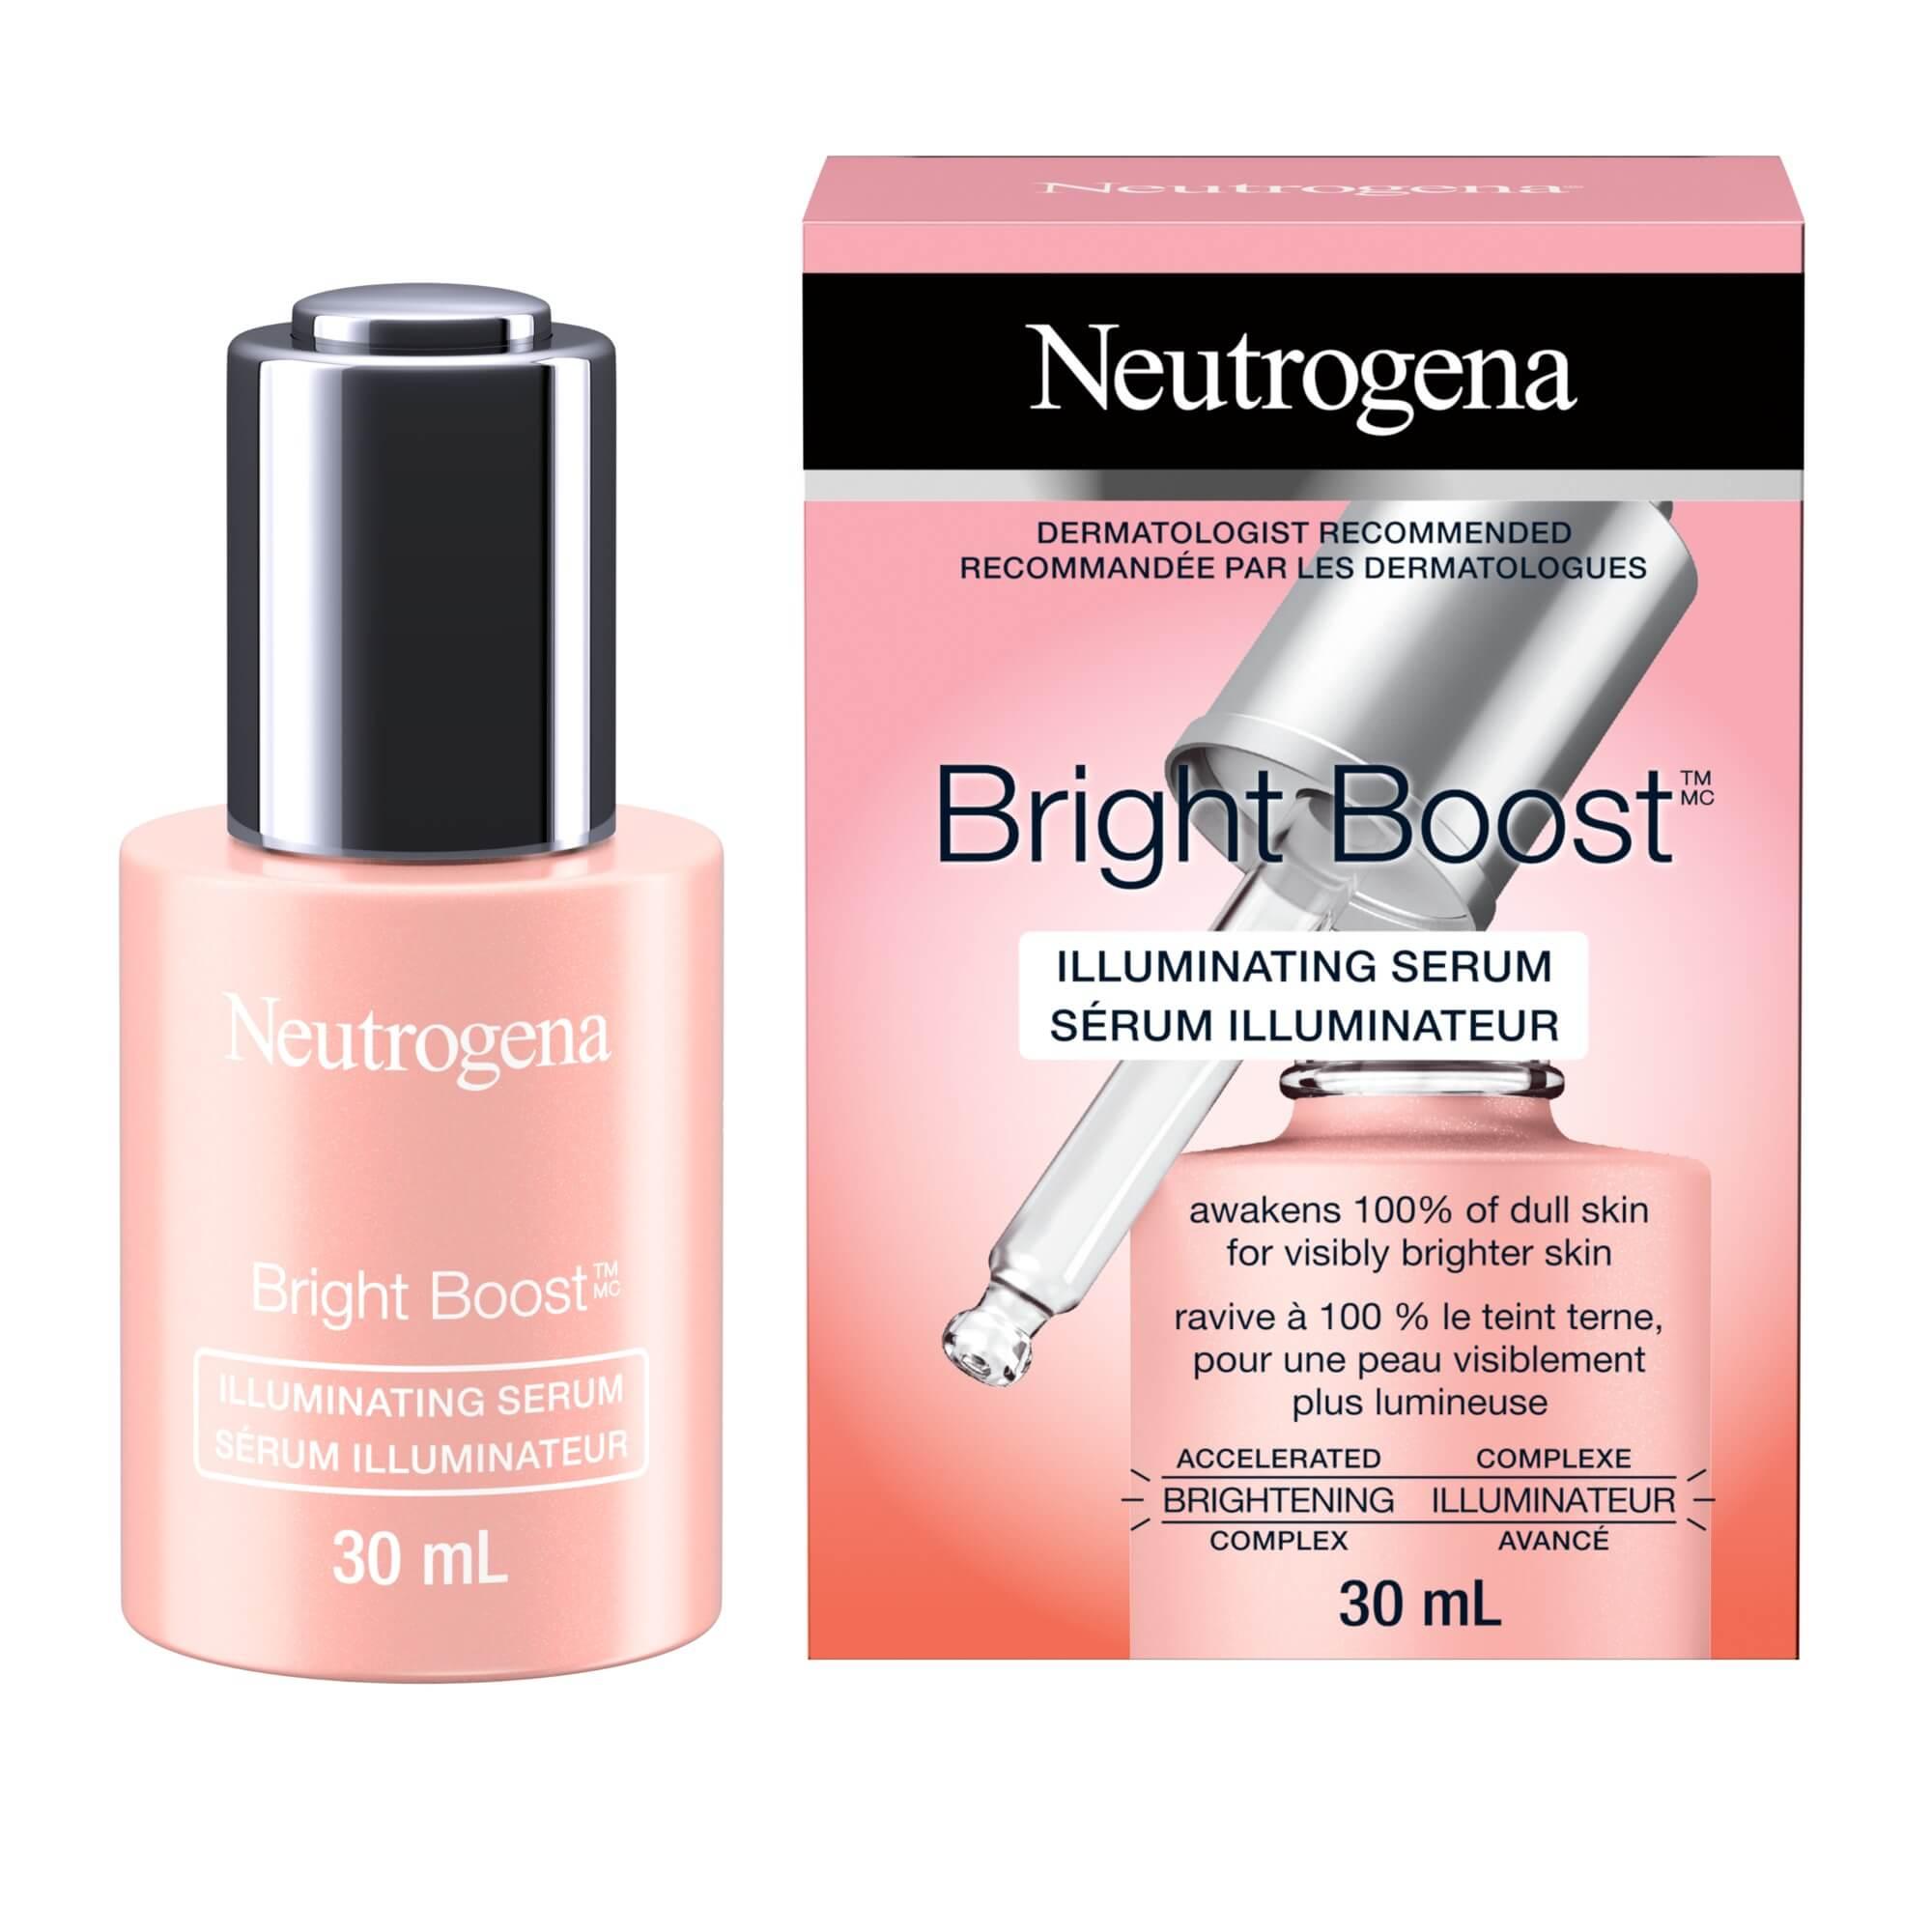 Sérum illuminateur Neutrogena Bright BoostMC, 30 ml